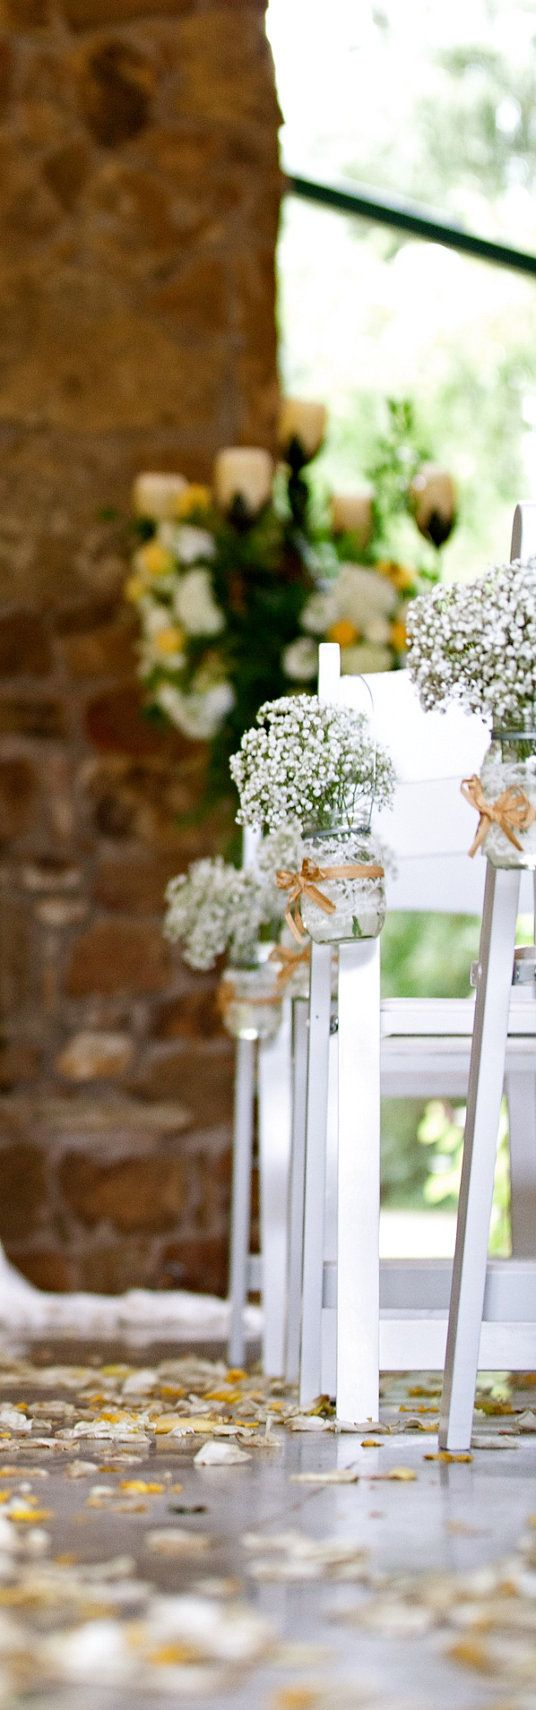 Vintage Mason Jar Vases for Wedding Ceremony Aisle, Vintage Rustic Wedding Decor, Set of 10 via Etsy